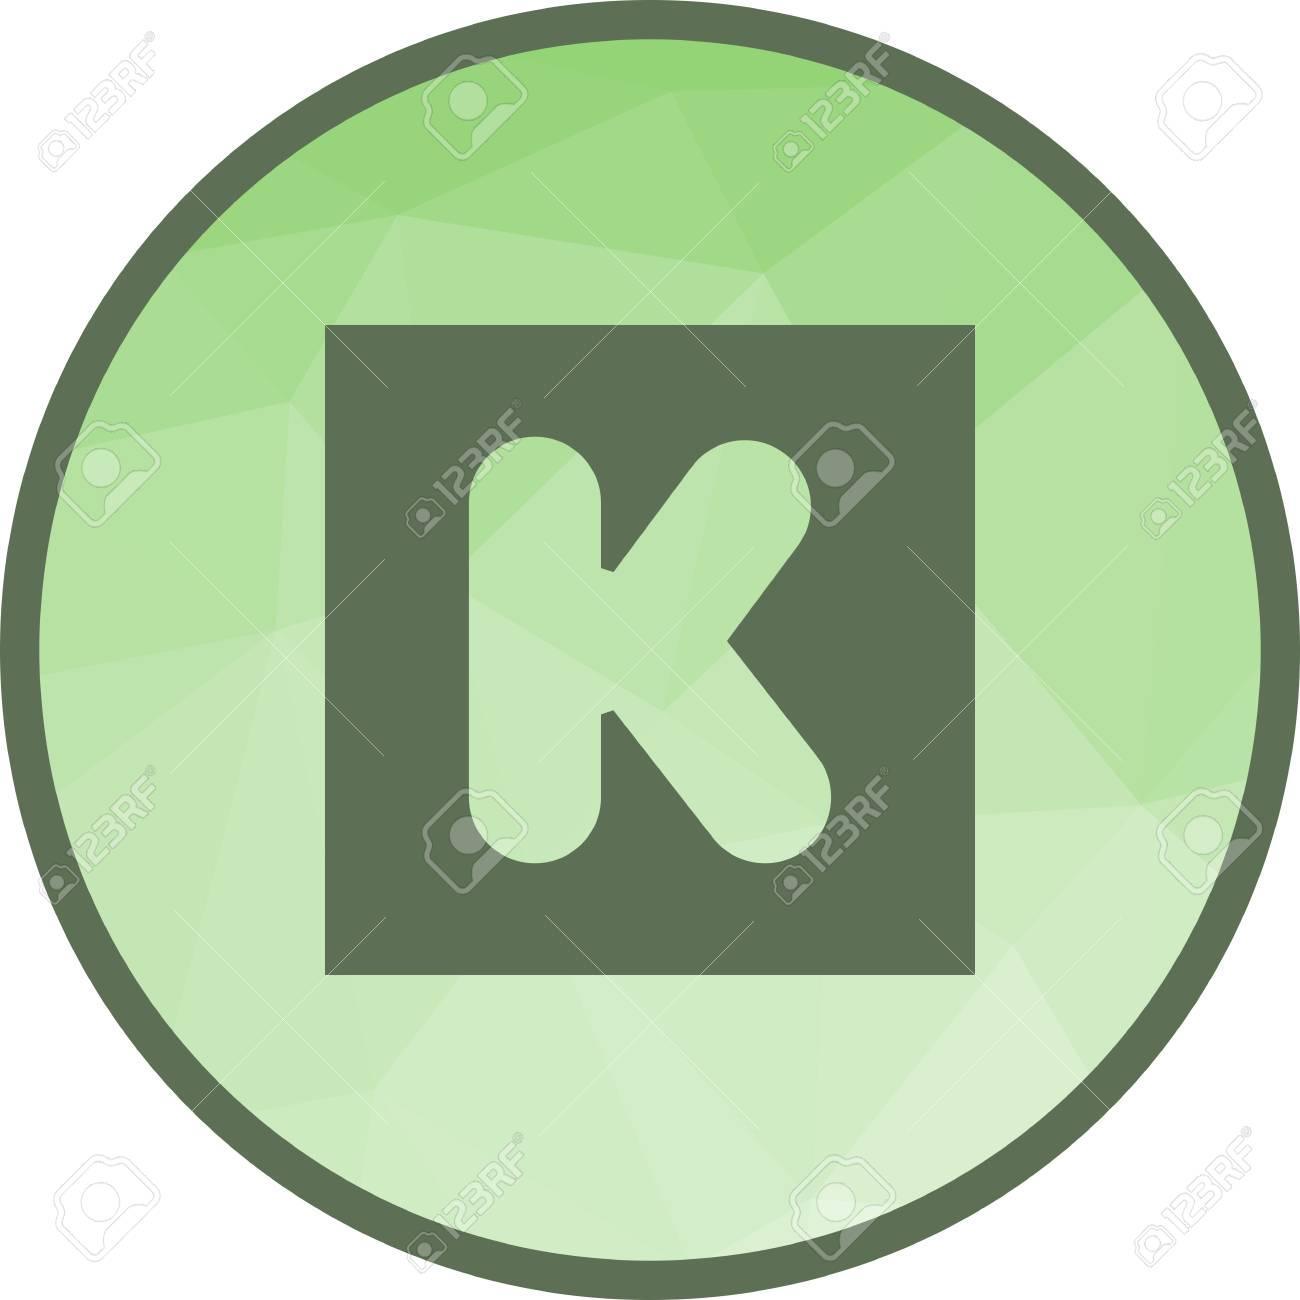 Kickstarter, crowdfunding, platform icon vector image  Can also